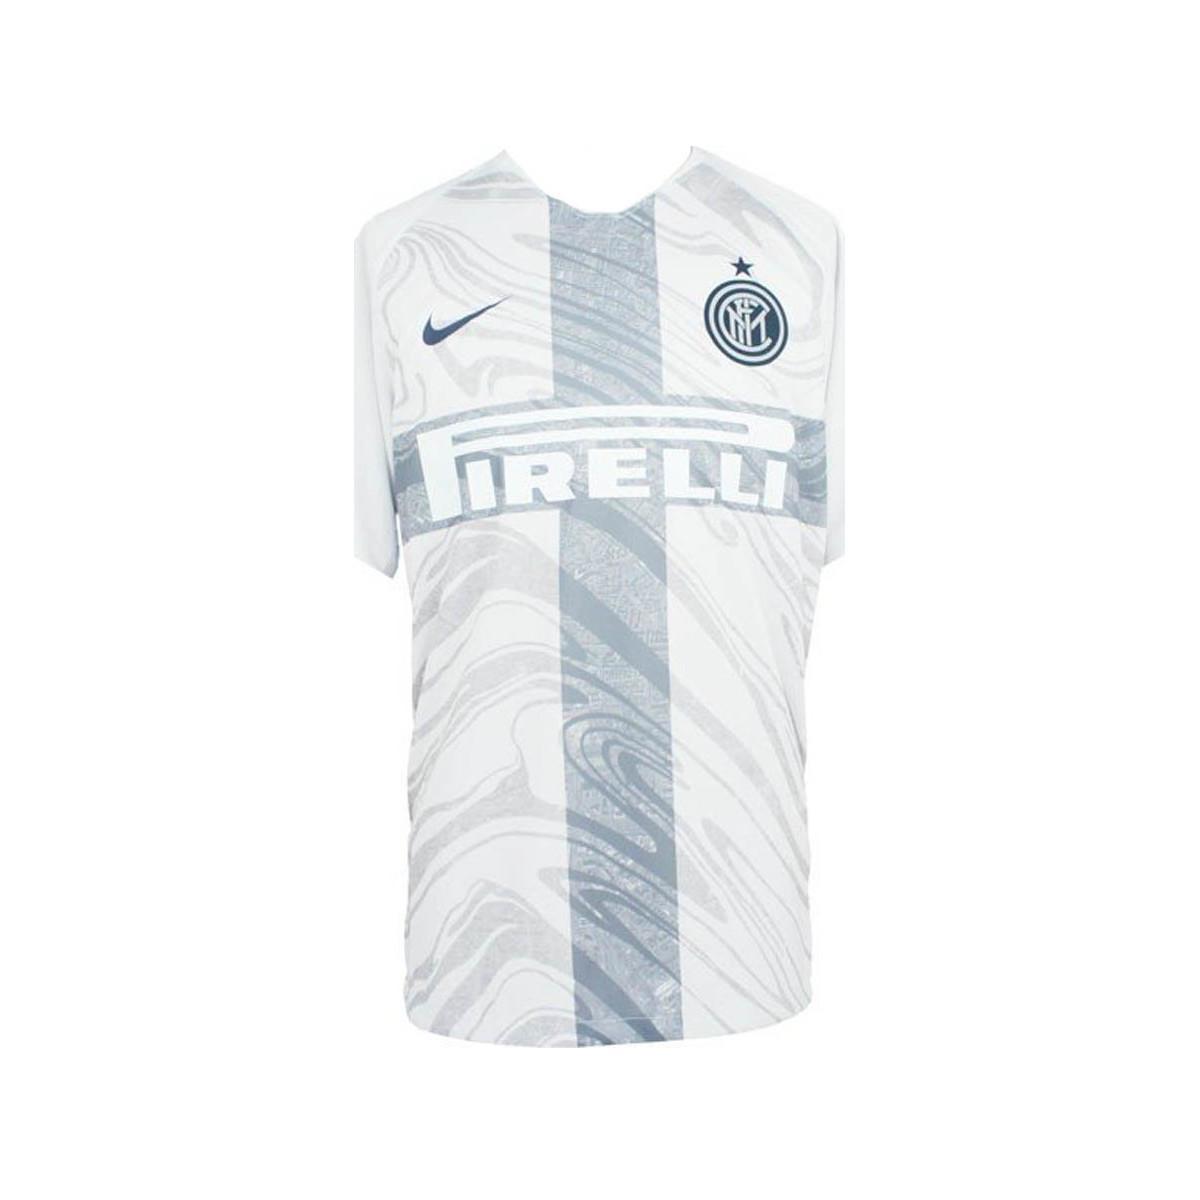 a98628d72 Nike 2018-2019 Inter Milan Third Football Shirt (icardi 9) Men's T ...